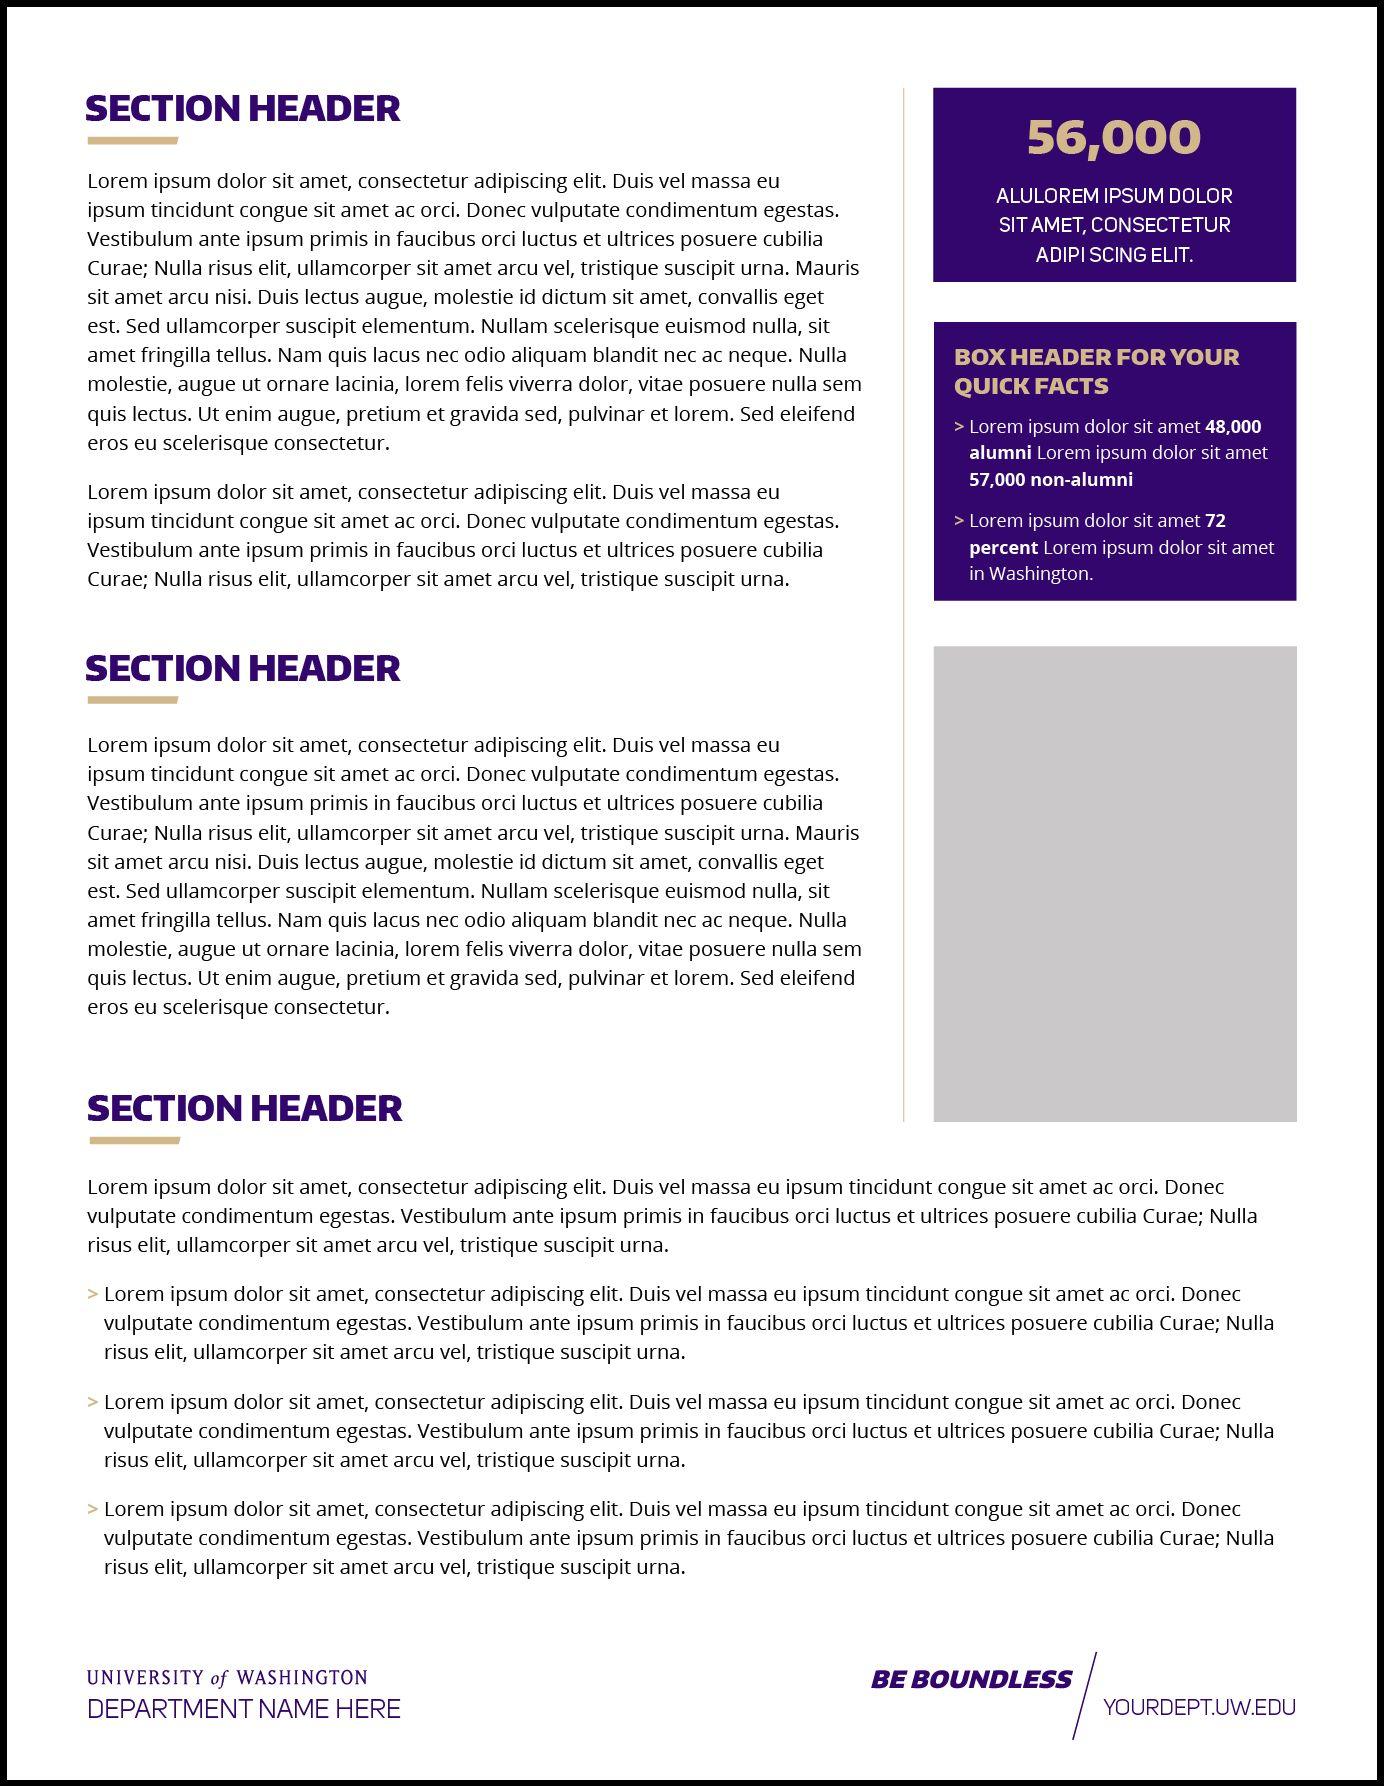 The Interesting Fact Sheet Uw Brand Throughout Fact Sheet Template Word Digital Photography Below Is Other Parts Word Template Fact Sheet Business Template